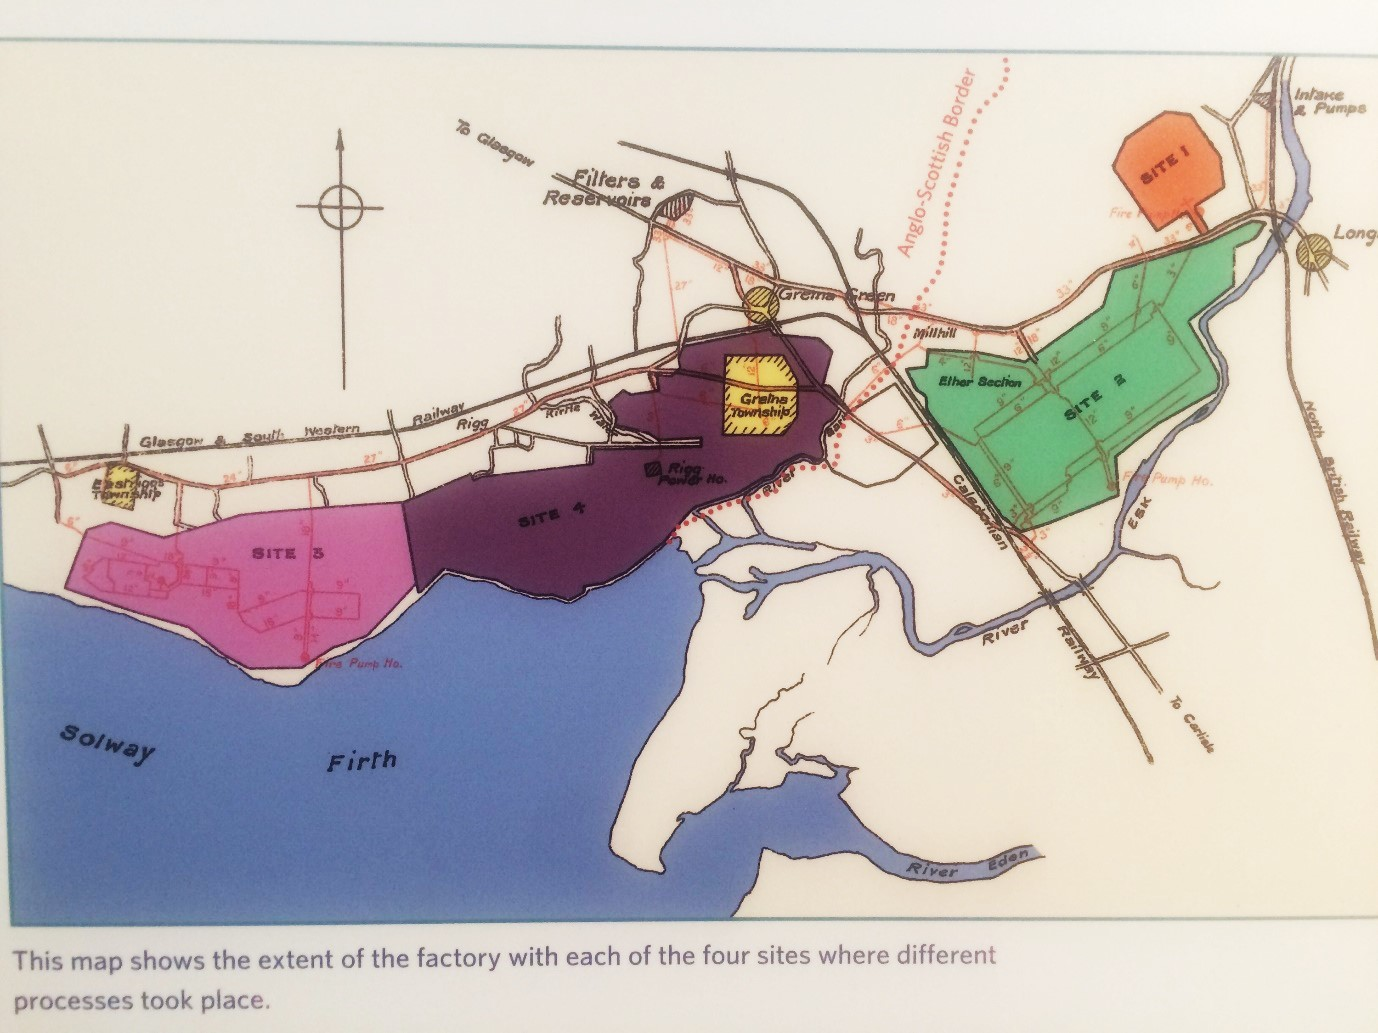 HM Factory Gretna map